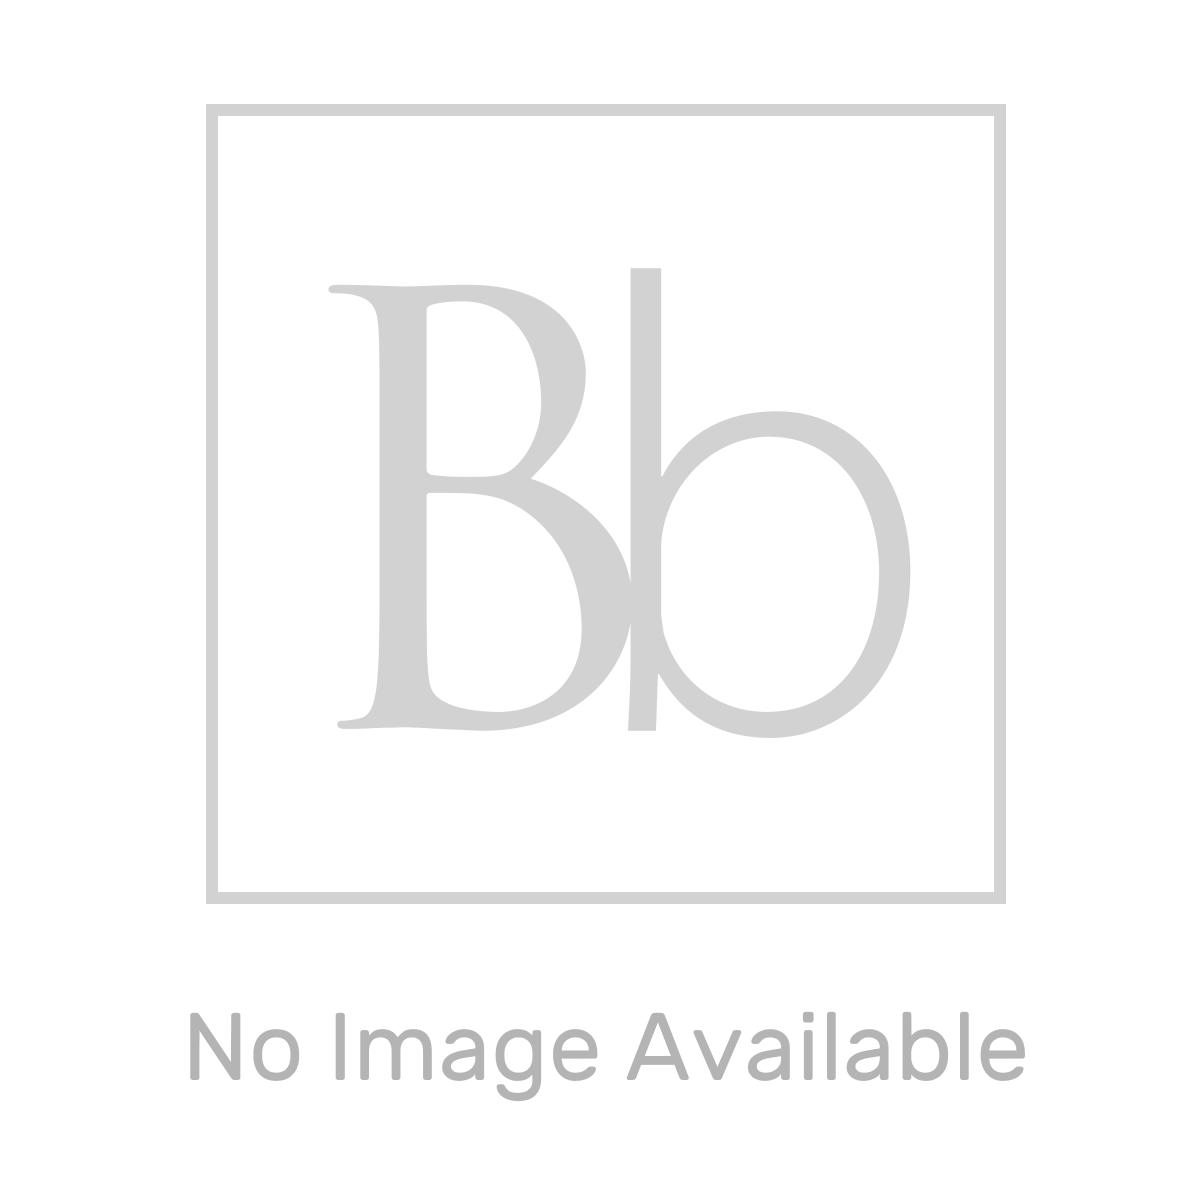 Nuie Athena Gloss Grey 2 Door Floor Standing Vanity Unit with 50mm Profile Basin 500mm Line Drawing